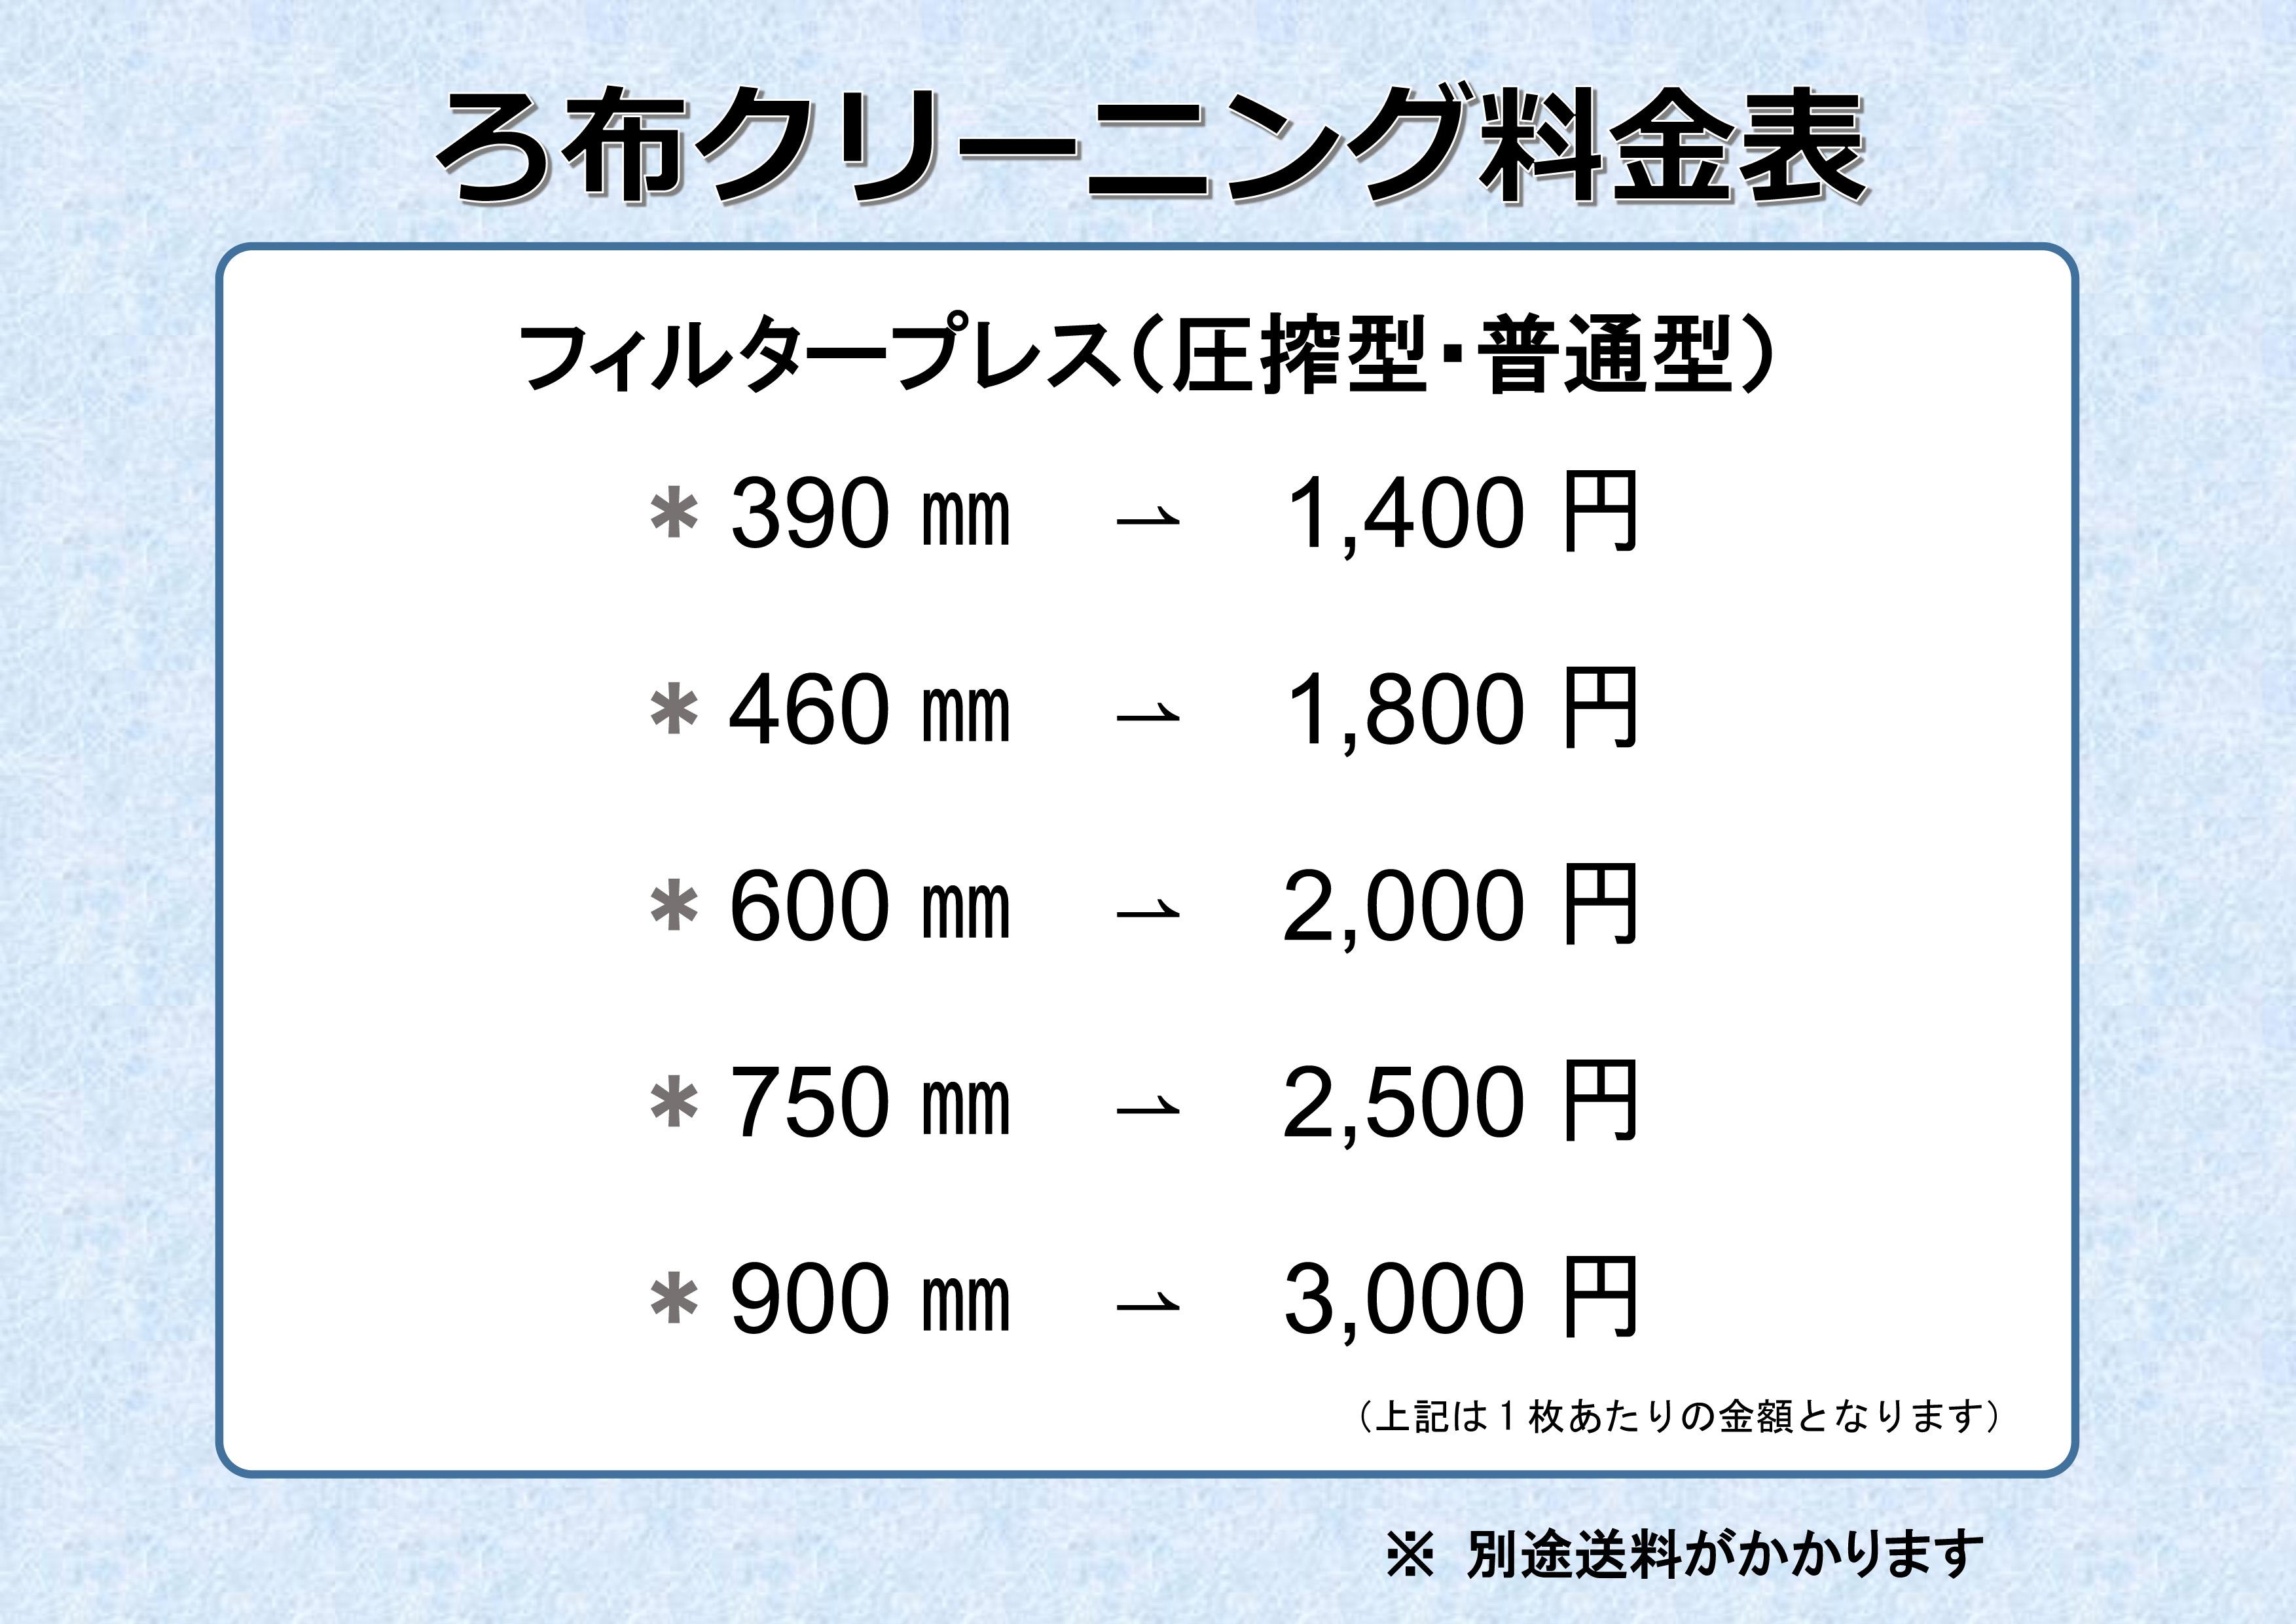 HPクリーニング価格表